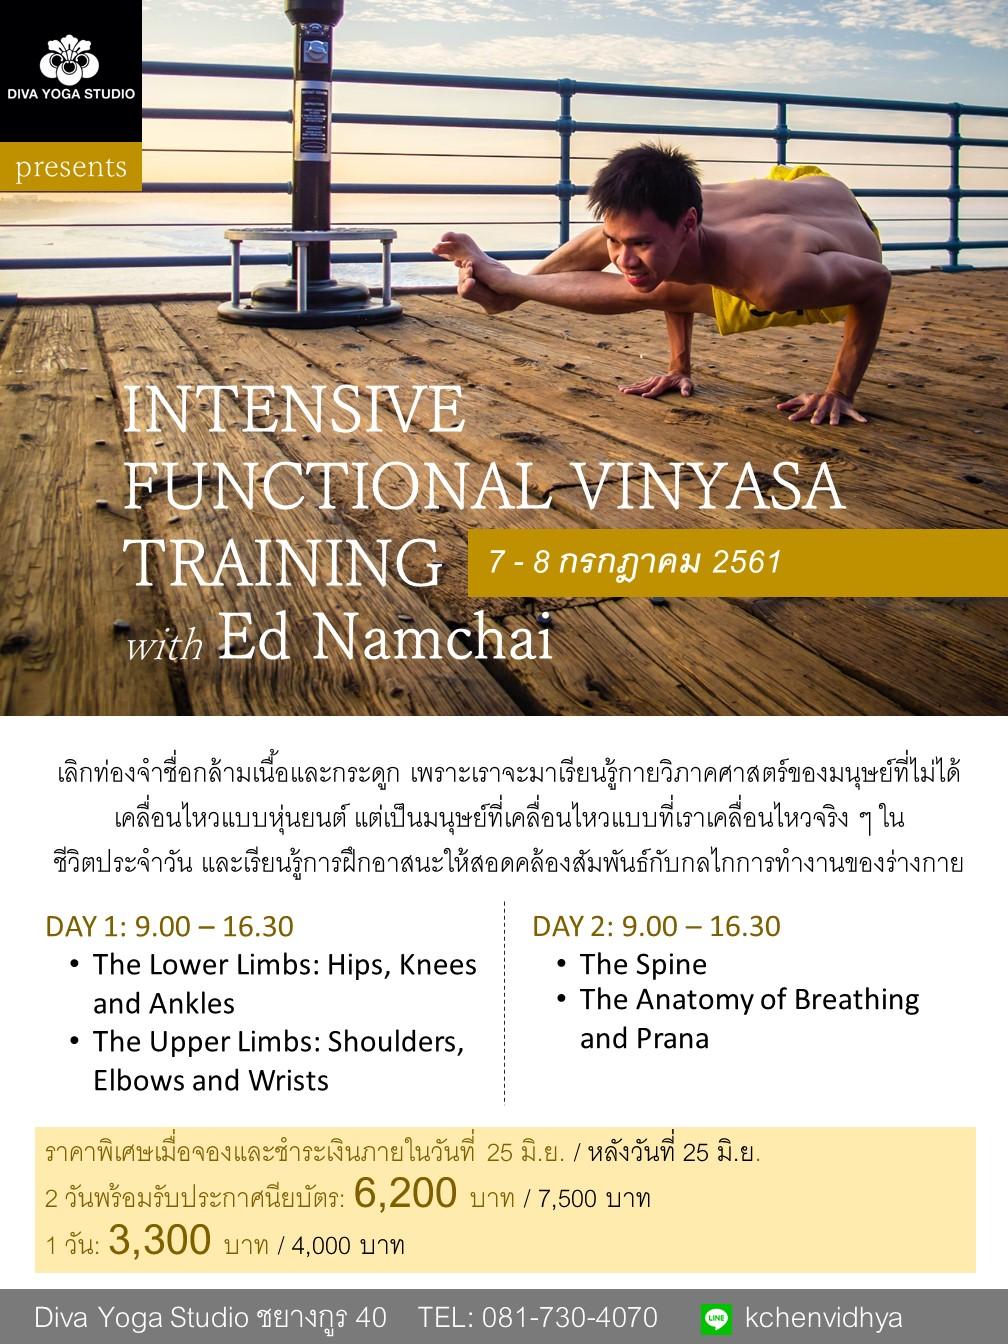 Intensive Functional Vinyasa Training with Ed Namchai